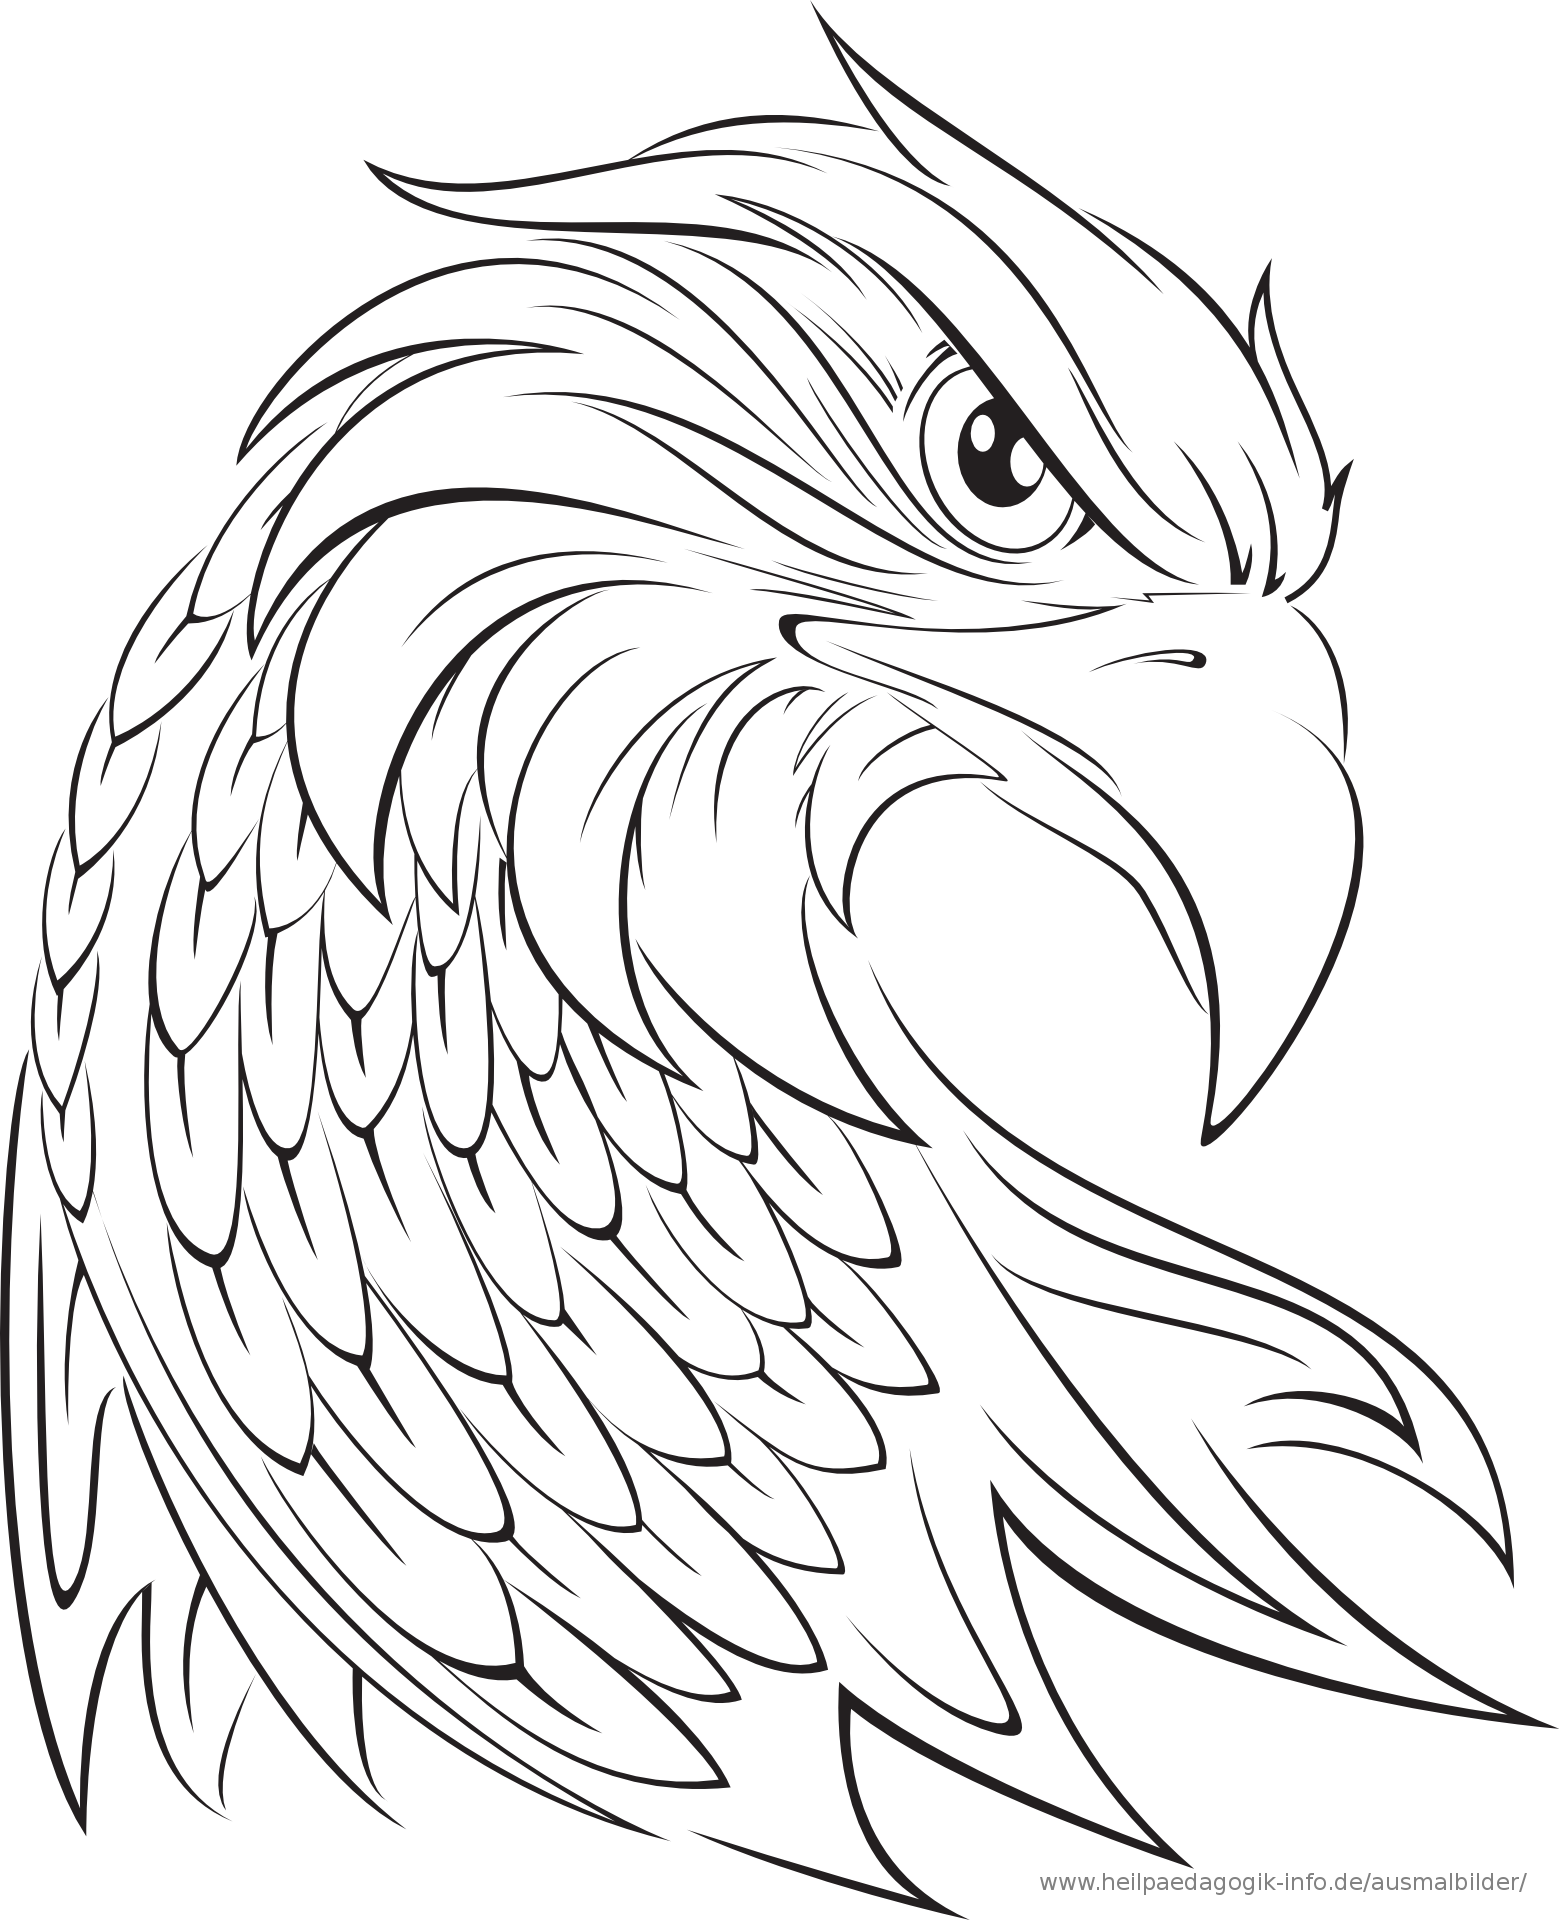 Adler Ausmalbild Celtic Knots Eagle Drawing Eagle